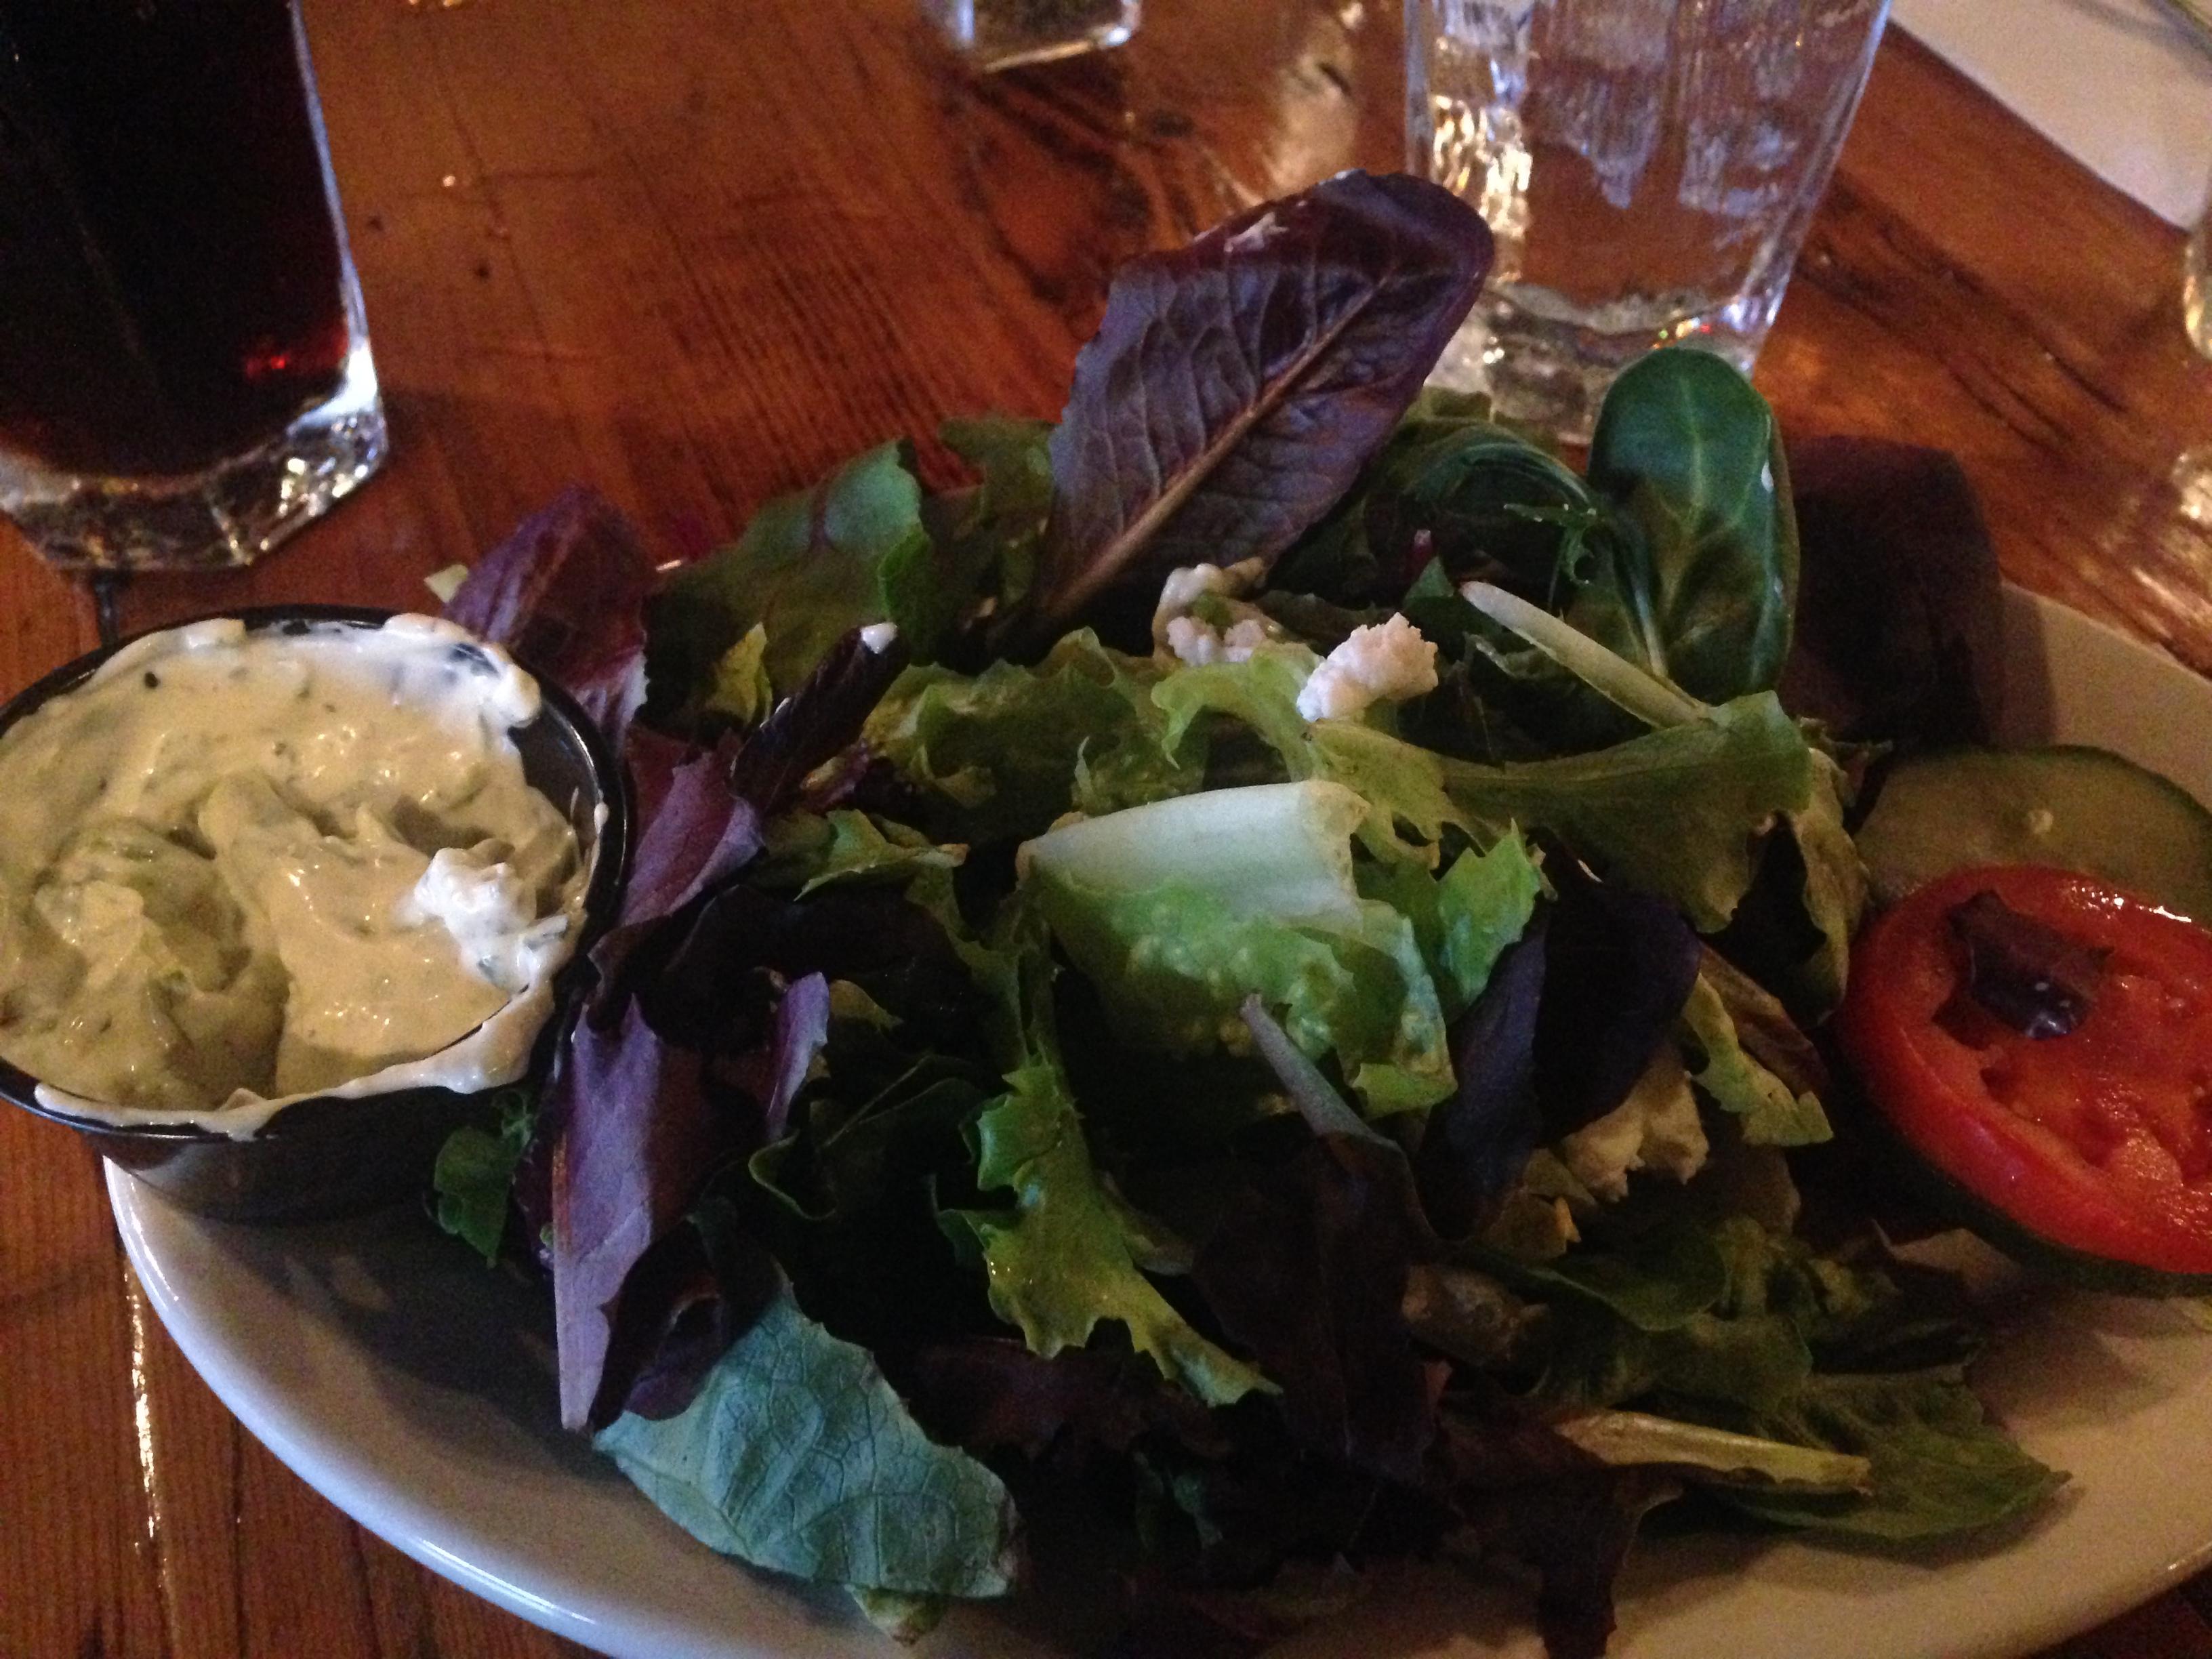 Miltons salad